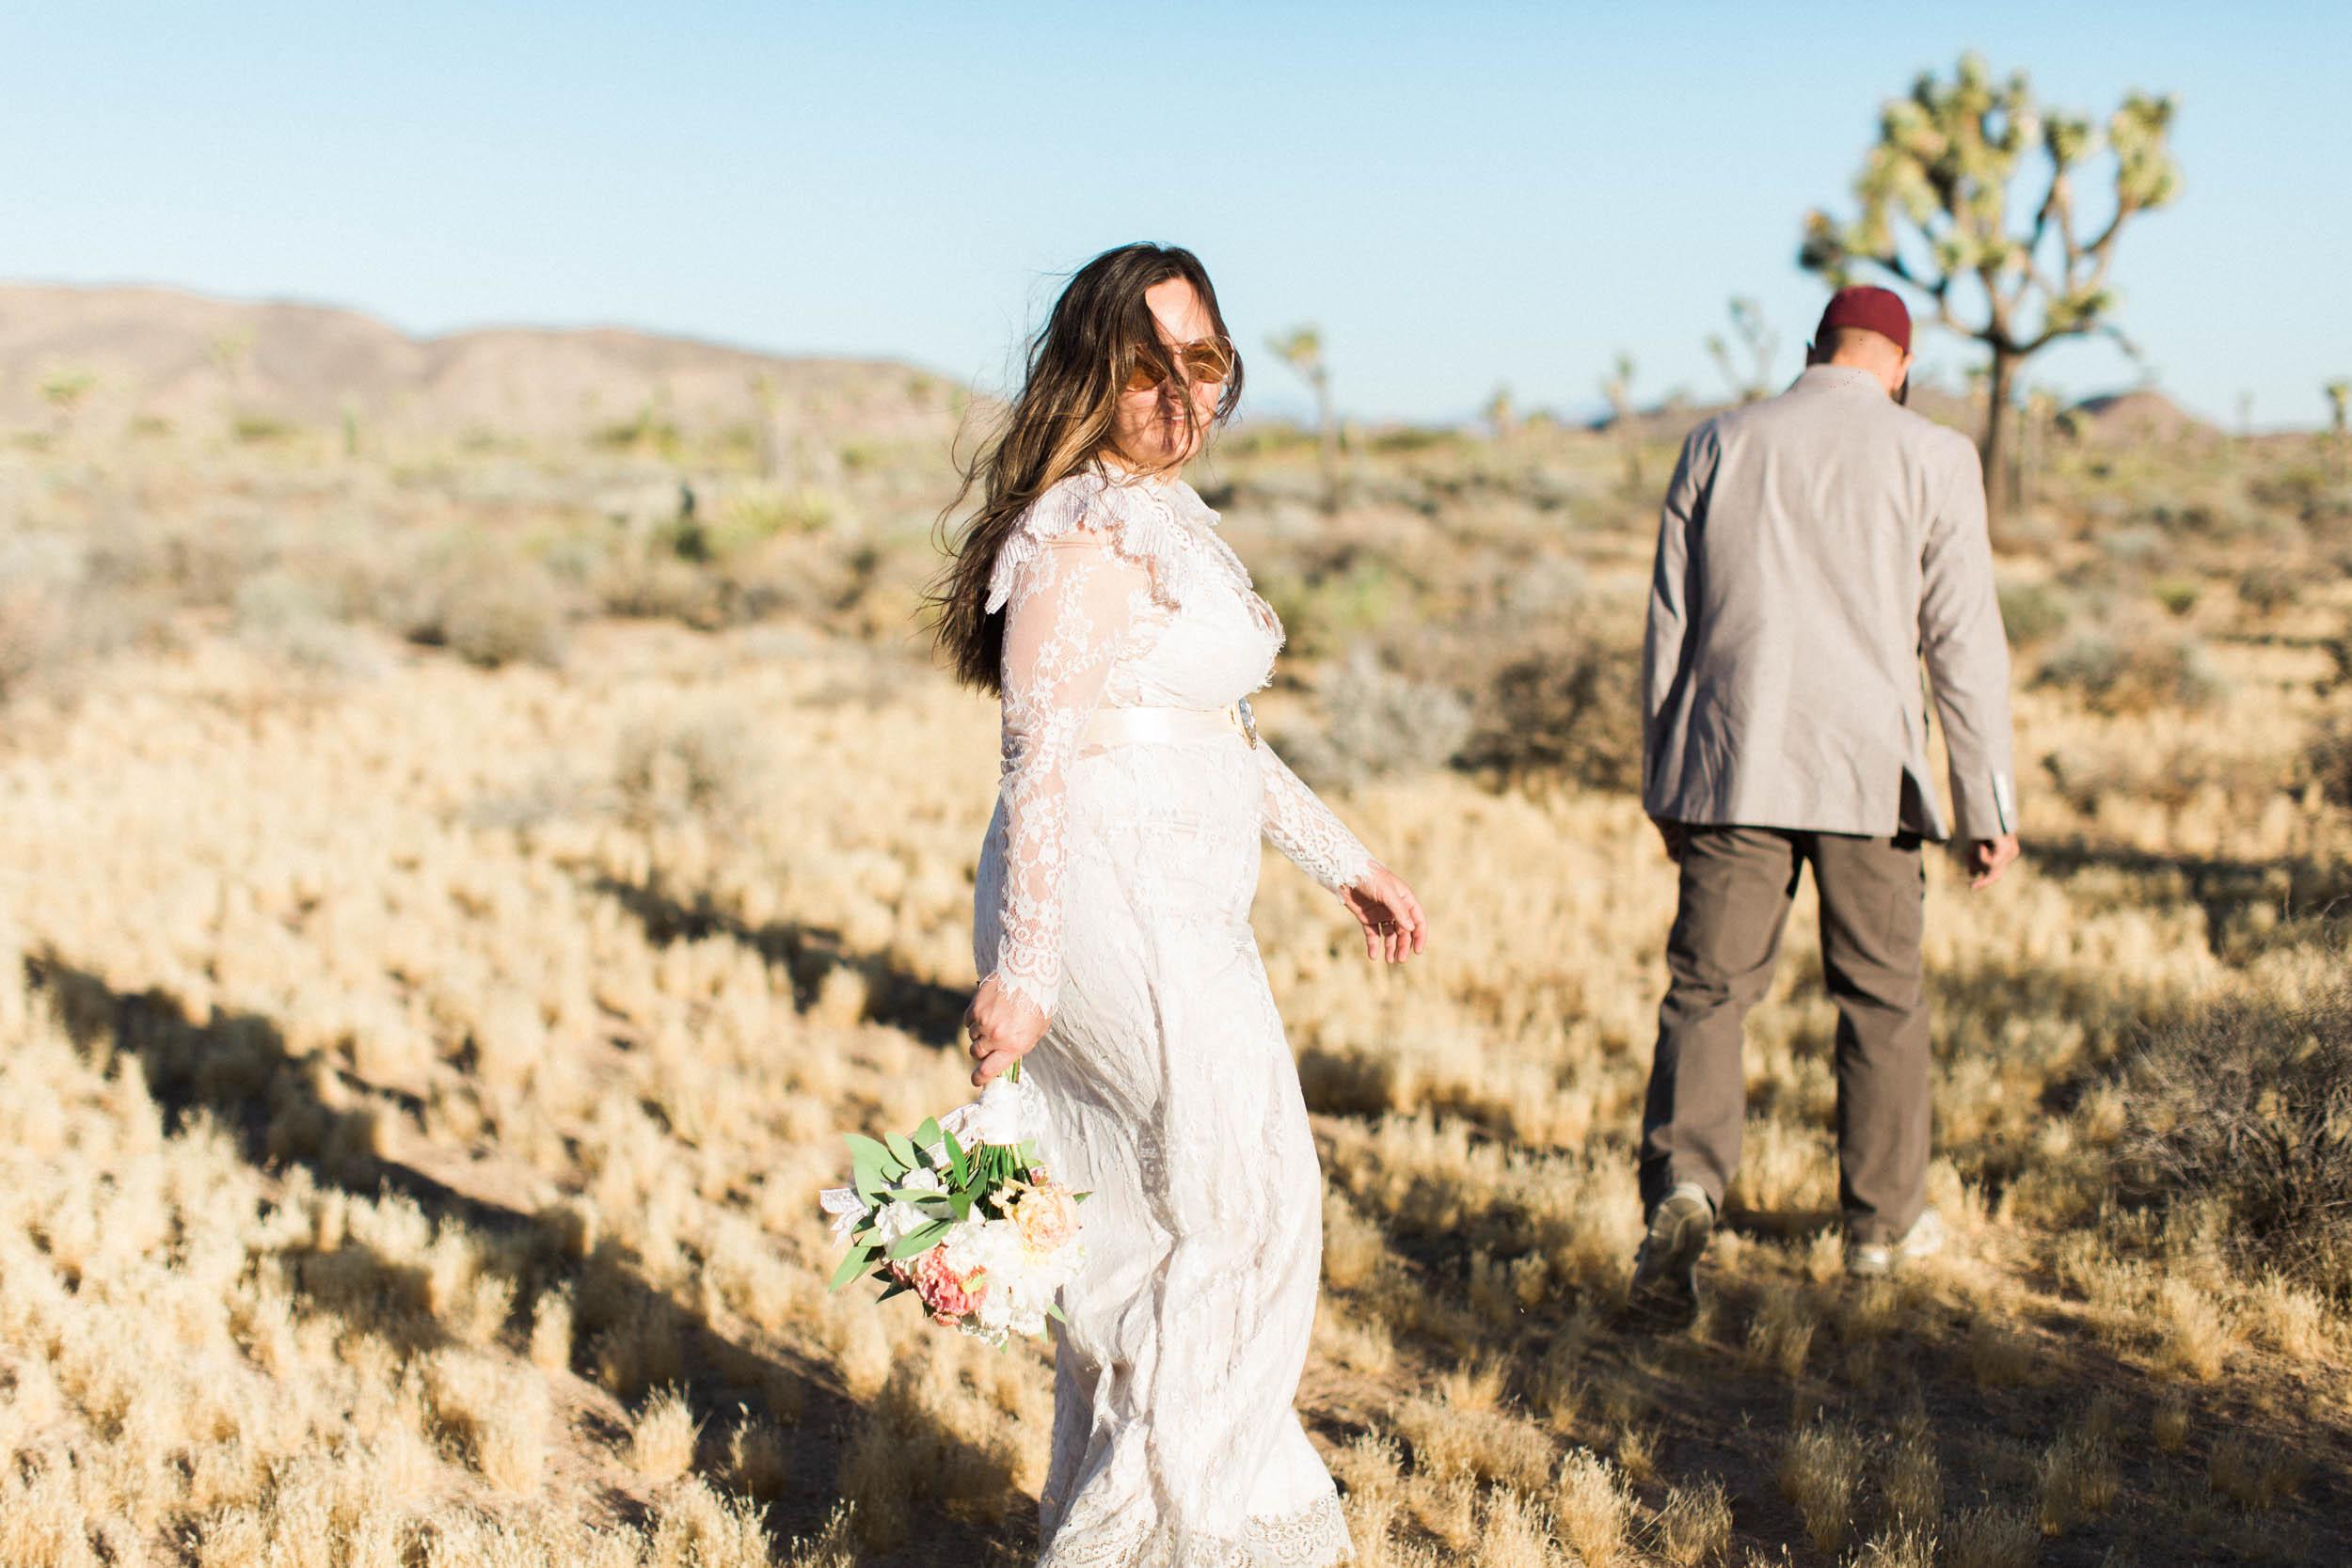 BKM-Photography-Joshua-Tree-Desert-Wedding-Elopement-0033.jpg